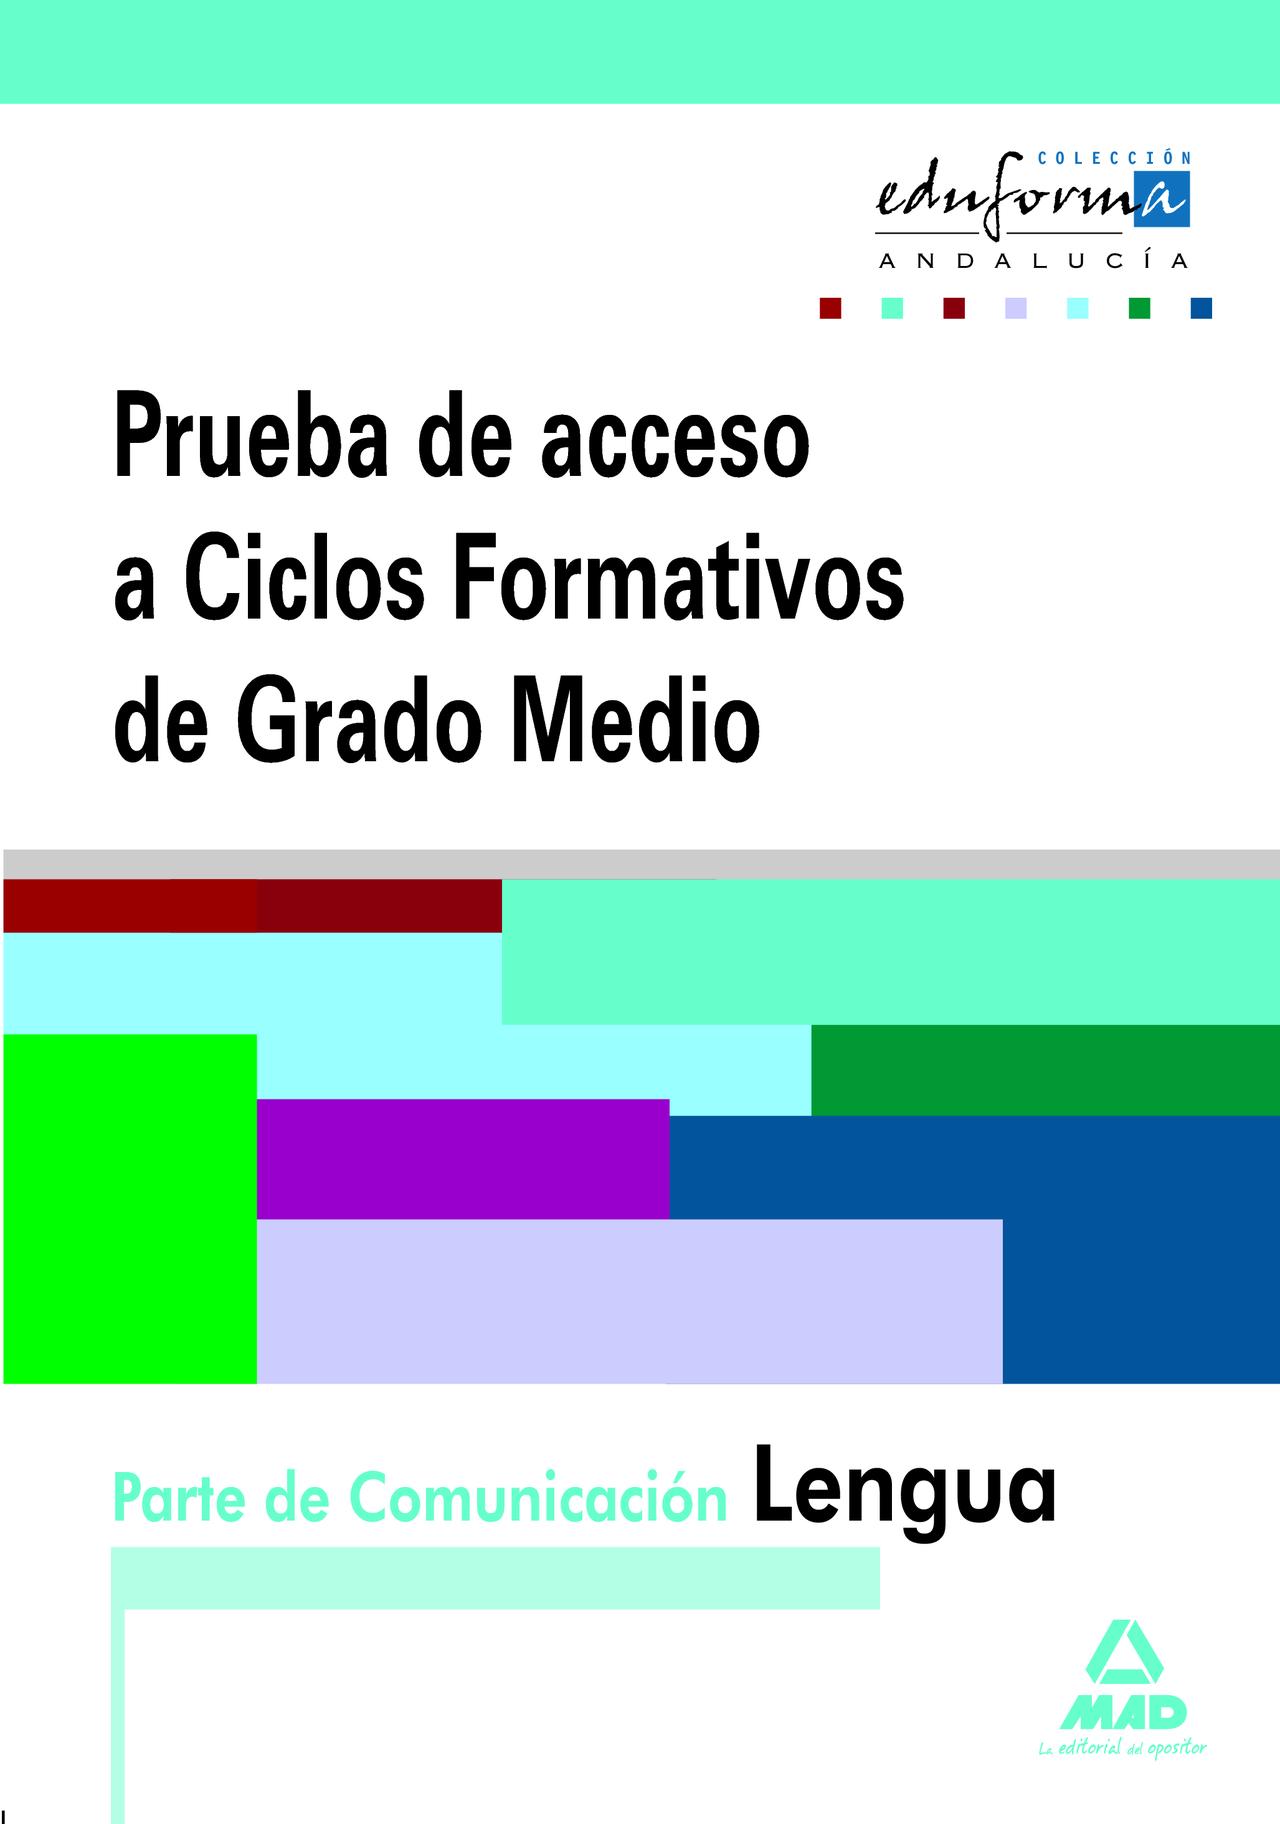 Pruebas De Acceso A Ciclos Formativos De Grado Medio Andalucía Parte De Comunicación Lengua